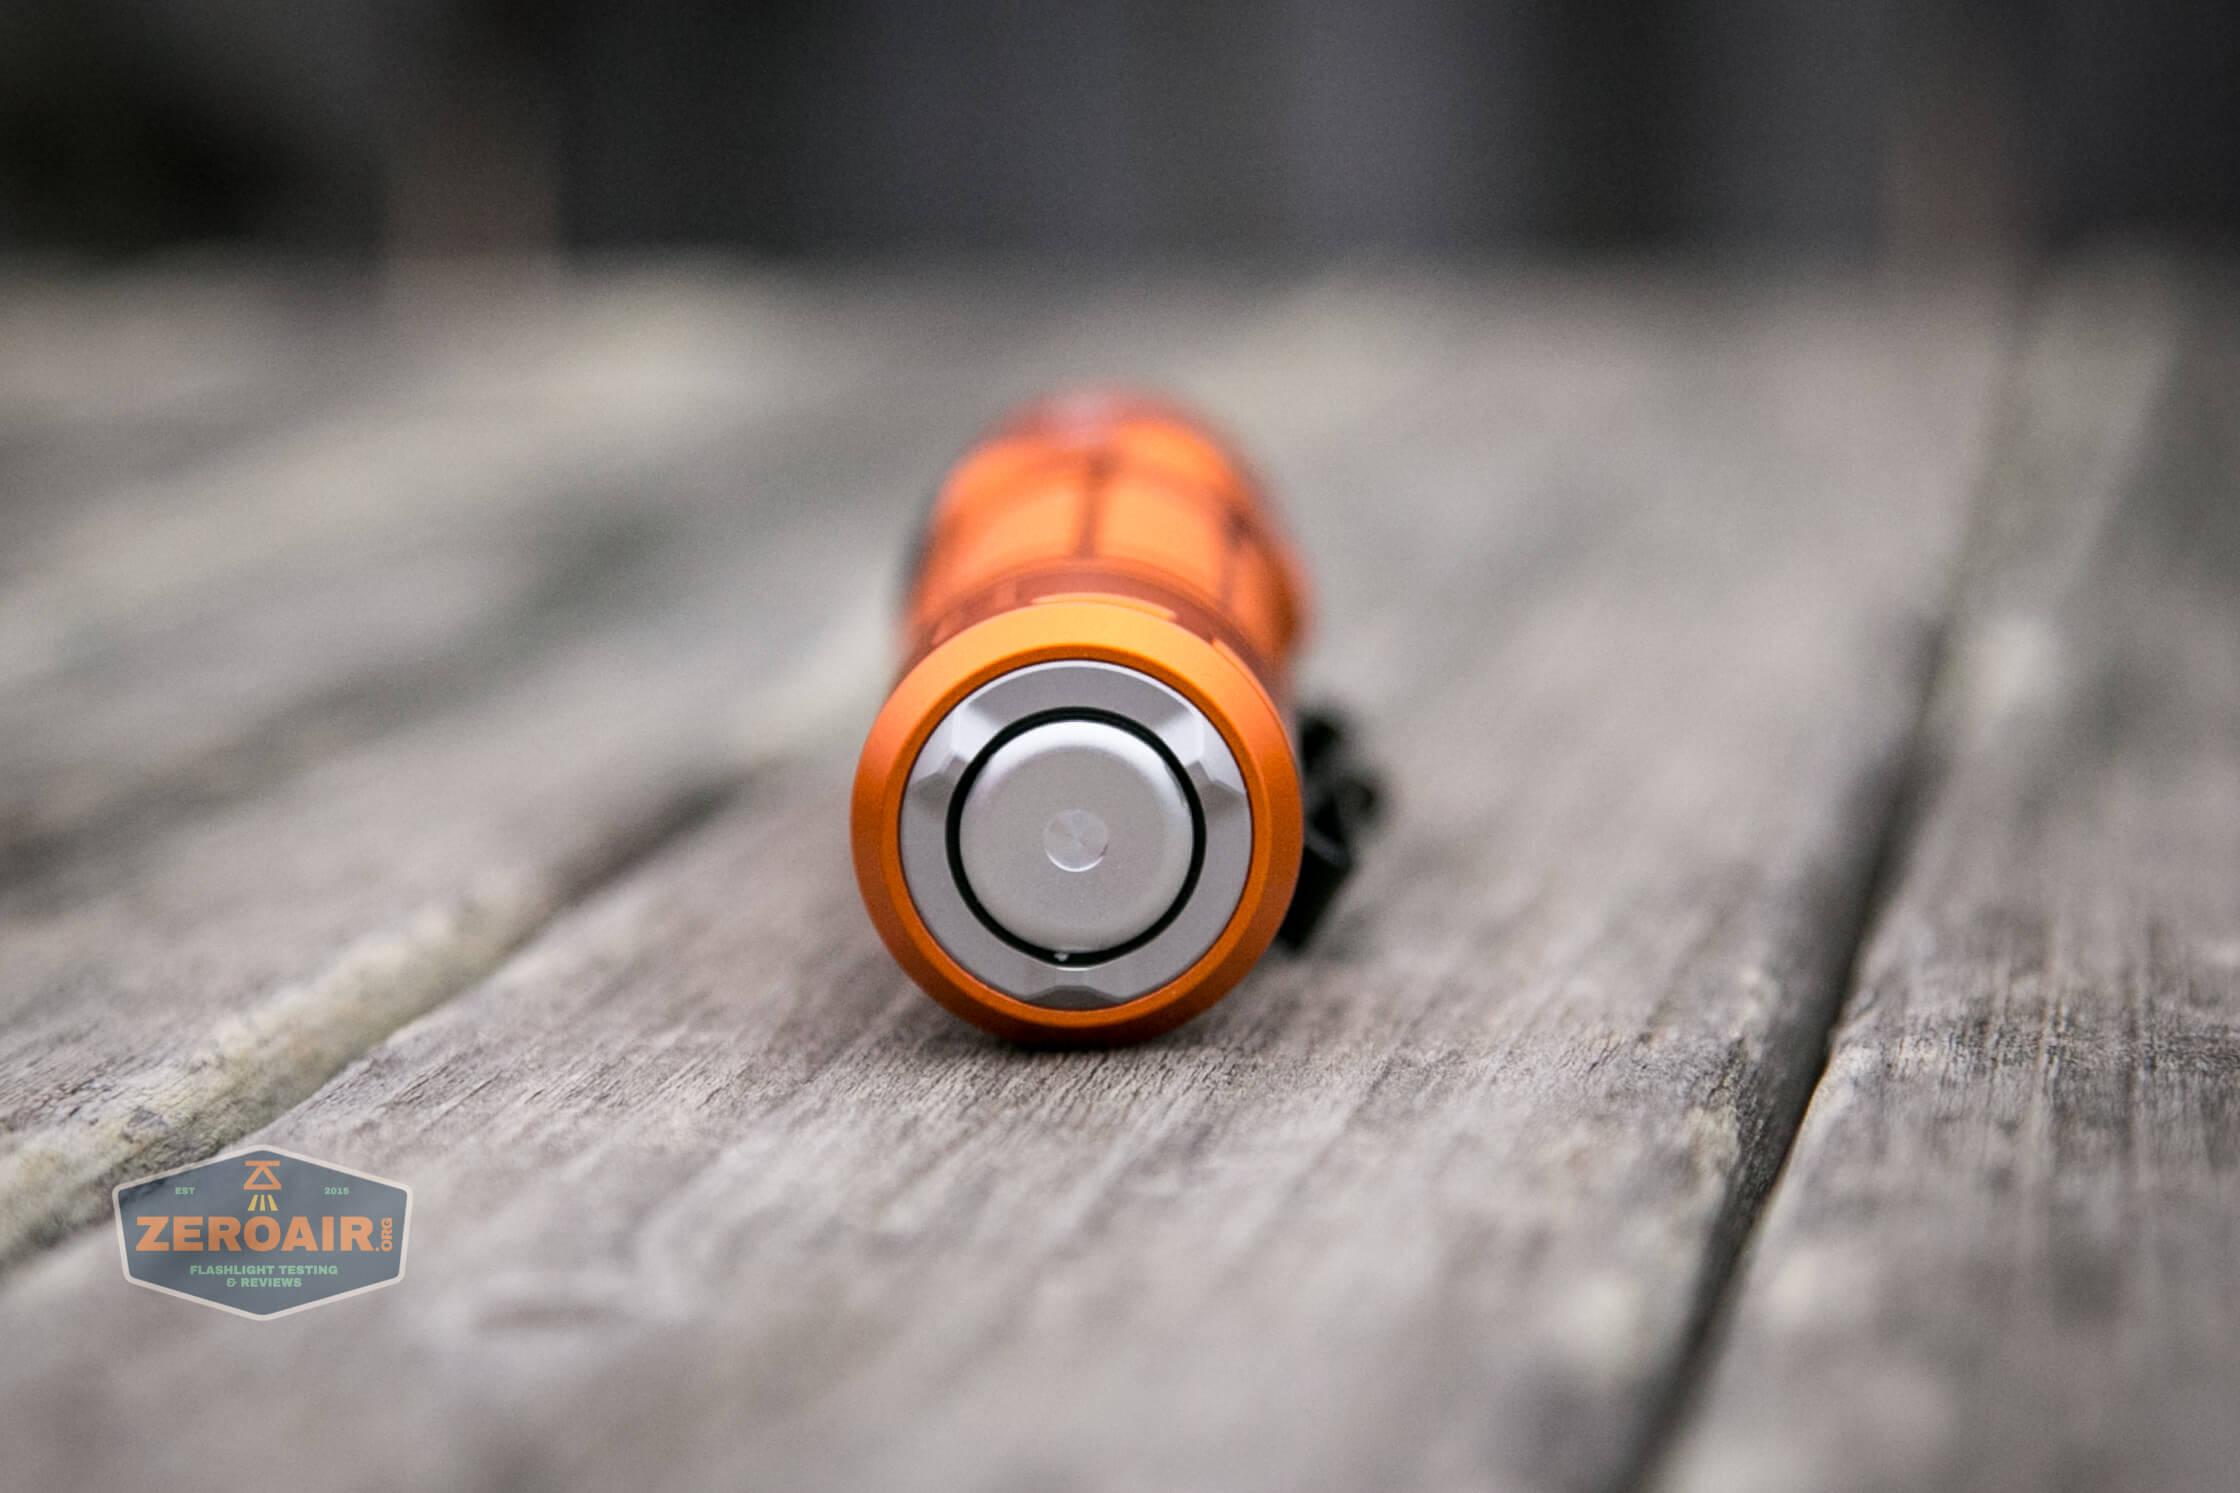 Olight M2R Pro Warrior Orange tailcap switch